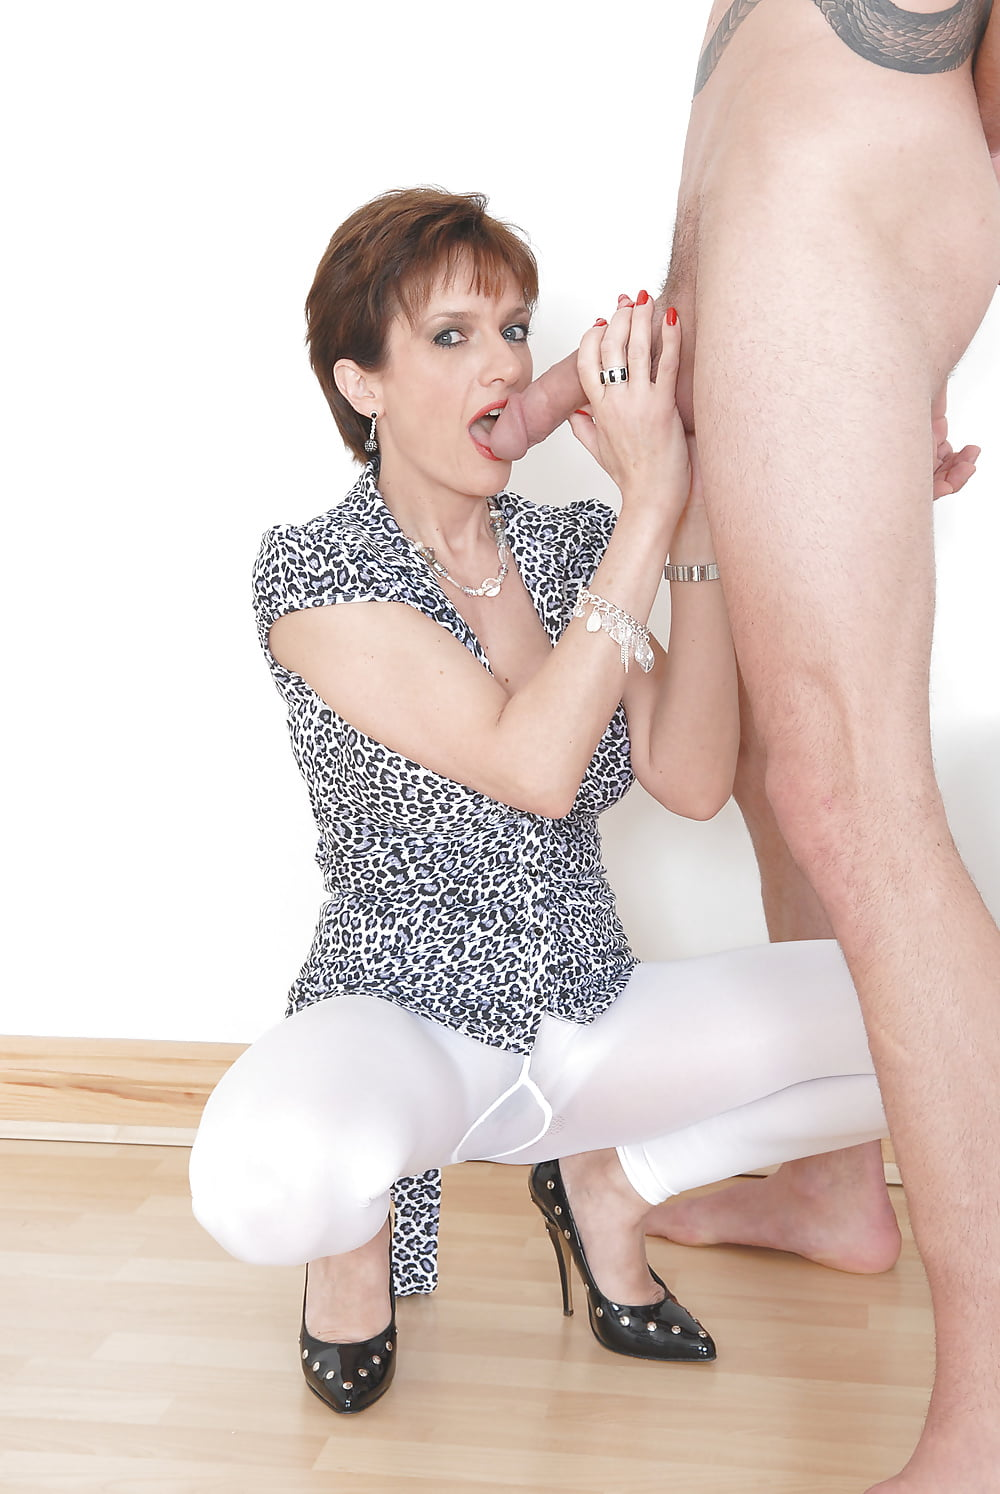 lady-sonia-handjob-nylons-tube-deepthroat-cumshot-dp